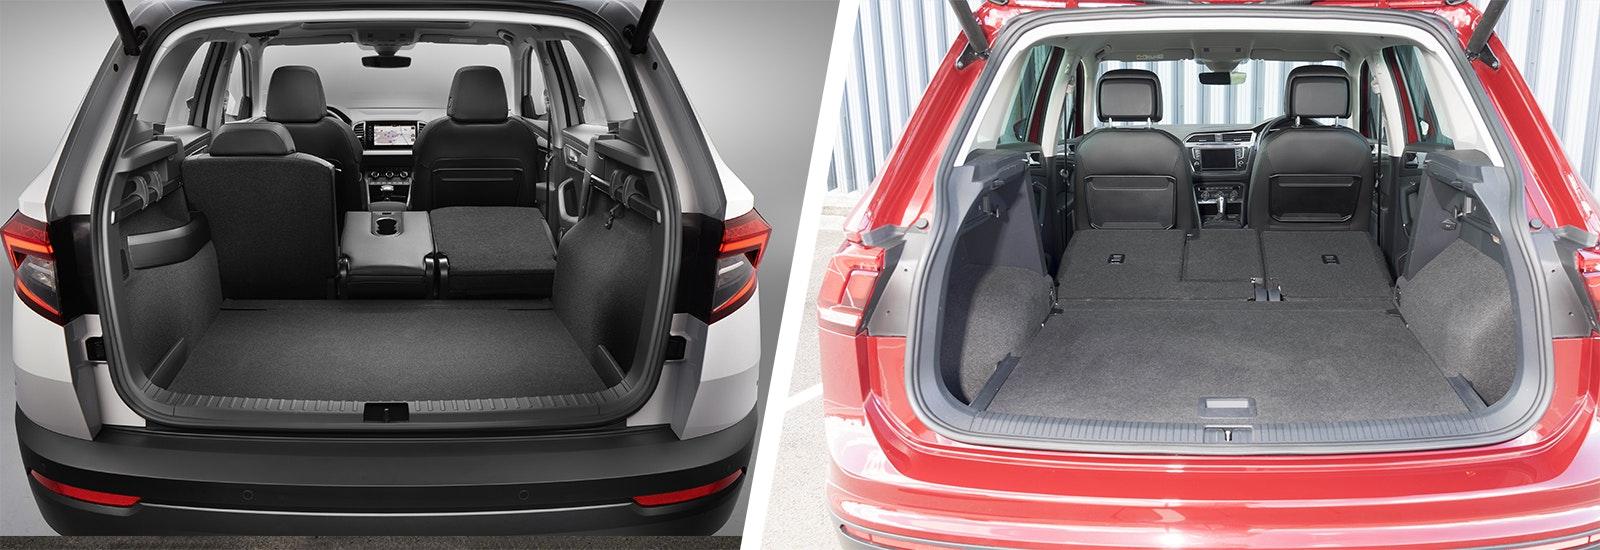 Skoda Karoq vs VW Tiguan – which is best? | carwow